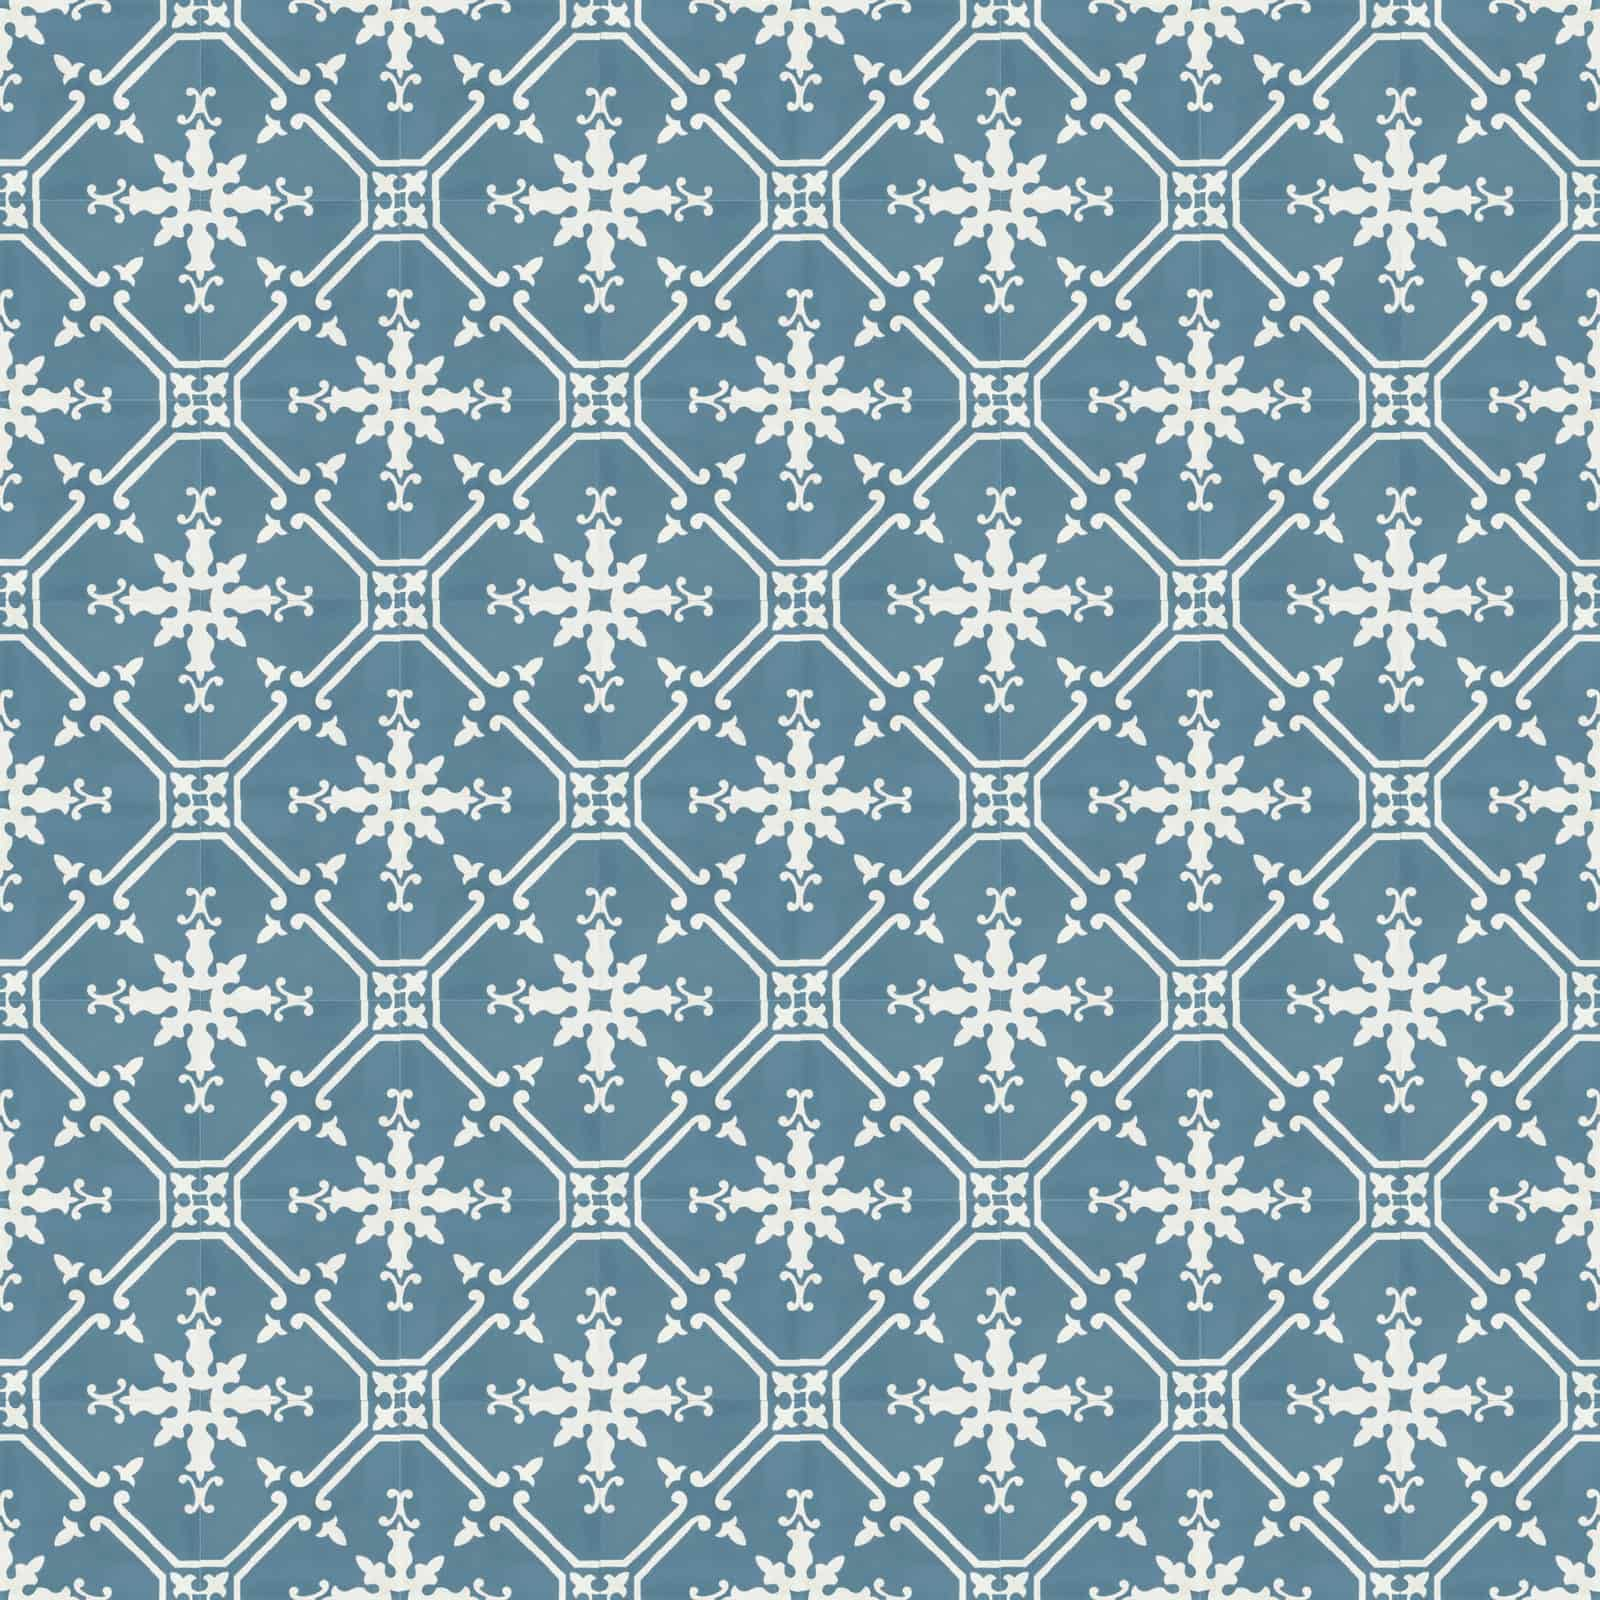 zementfliesen-verlegemuster-nummer-11540-viaplatten | 11540